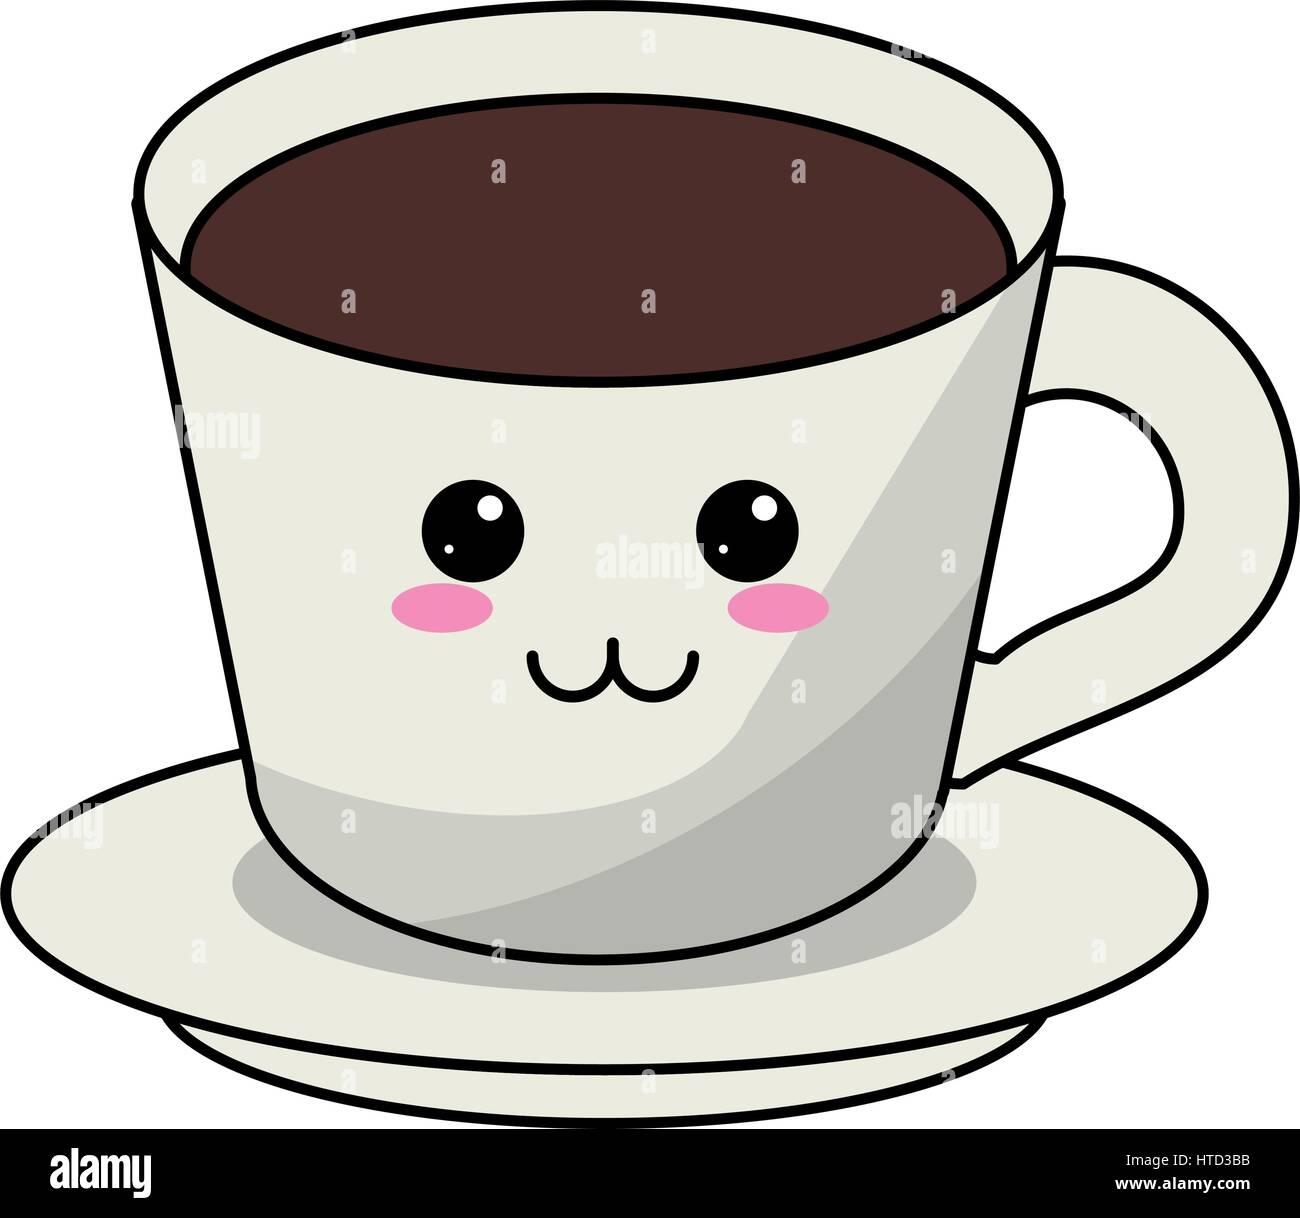 kawaii coffee cup plate  sc 1 st  Alamy & kawaii coffee cup plate Stock Vector Art u0026 Illustration Vector ...